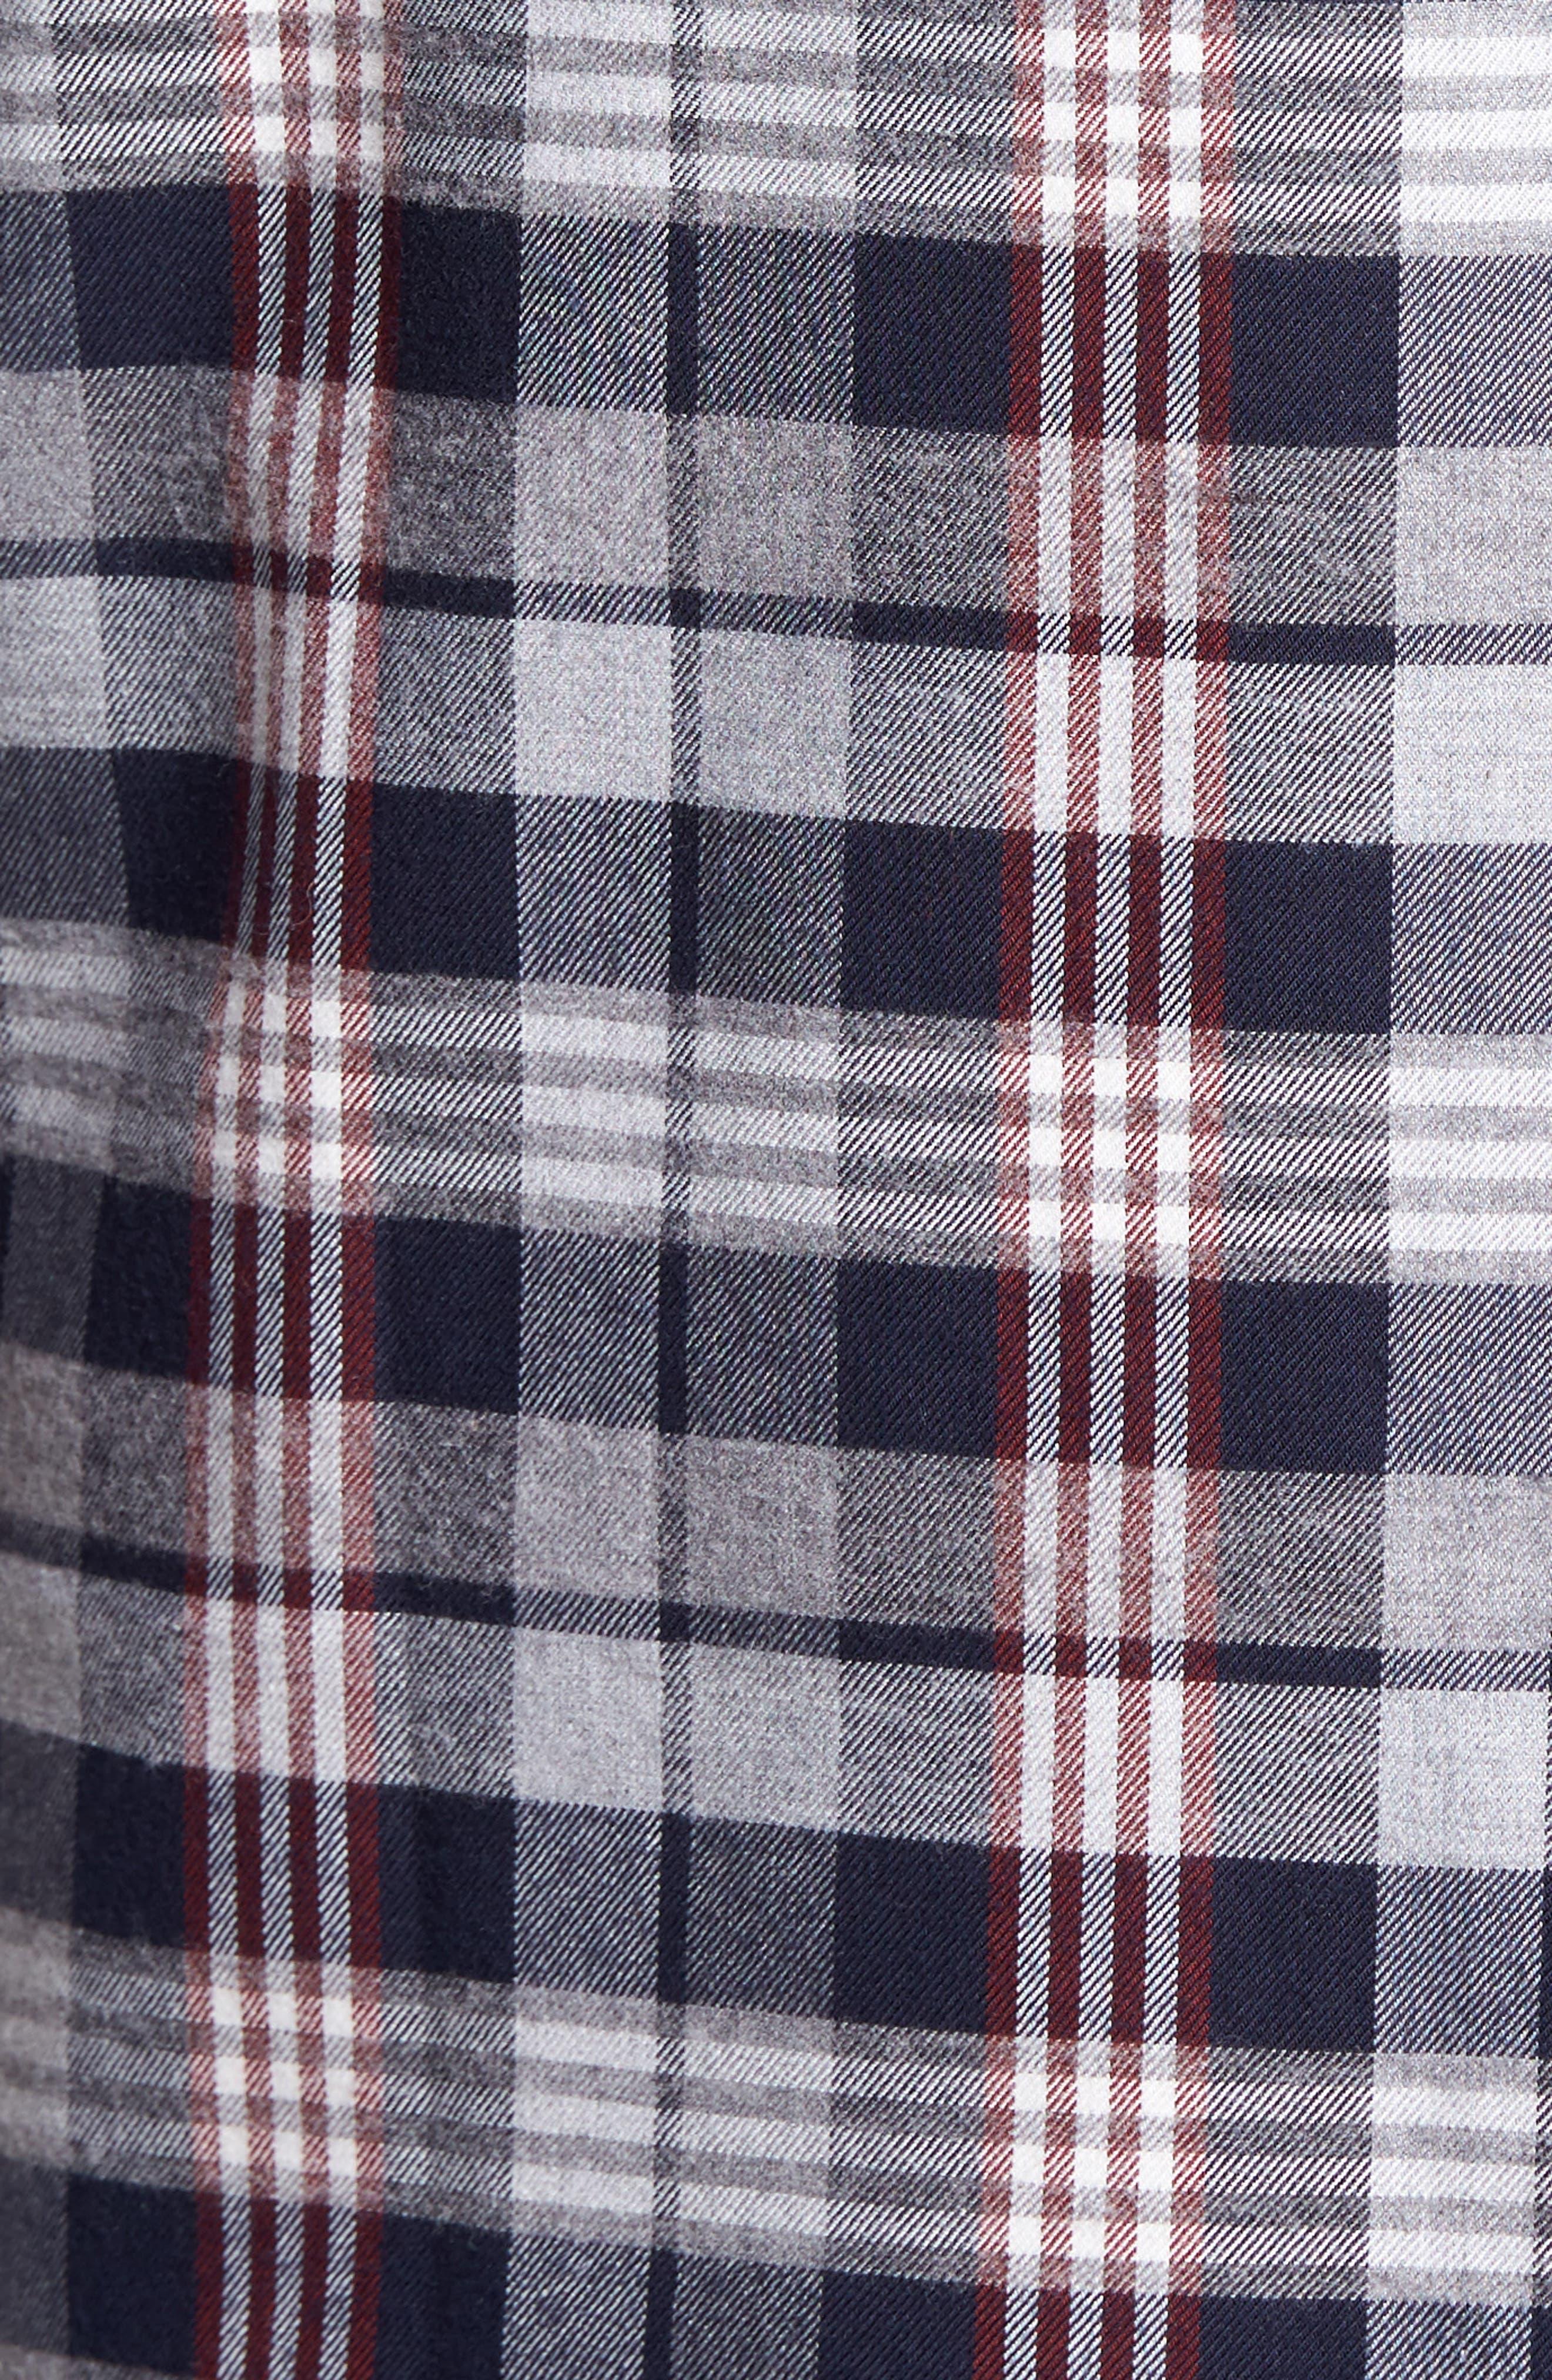 Check Twill Shirt,                             Alternate thumbnail 5, color,                             409